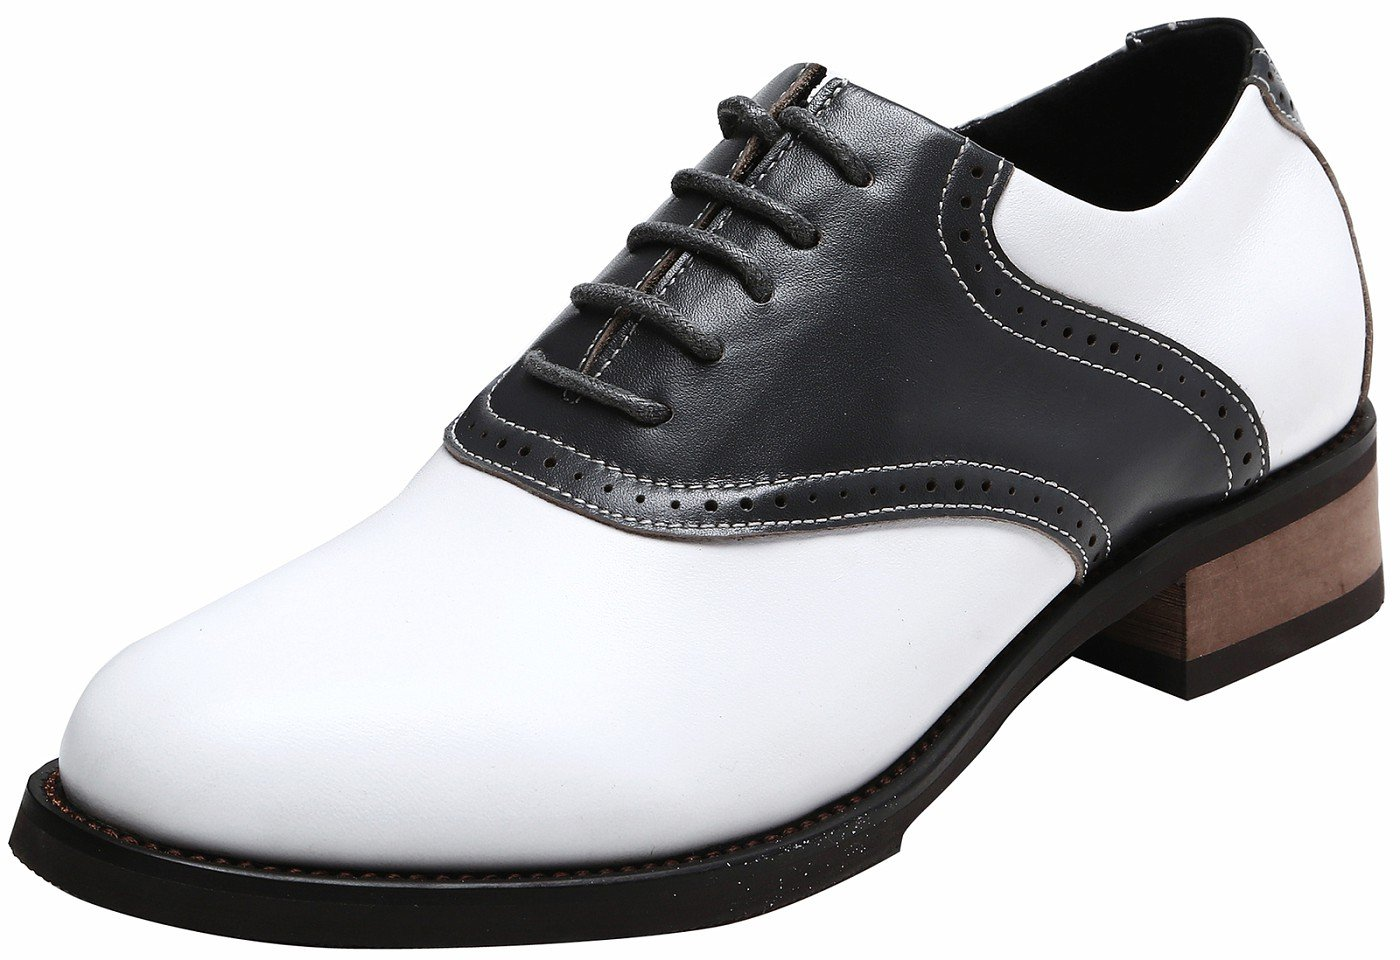 U-lite Women's Classic Retro Saddle Shoes,Lady's Round-Toe Leather Sadie Oxford Grey8